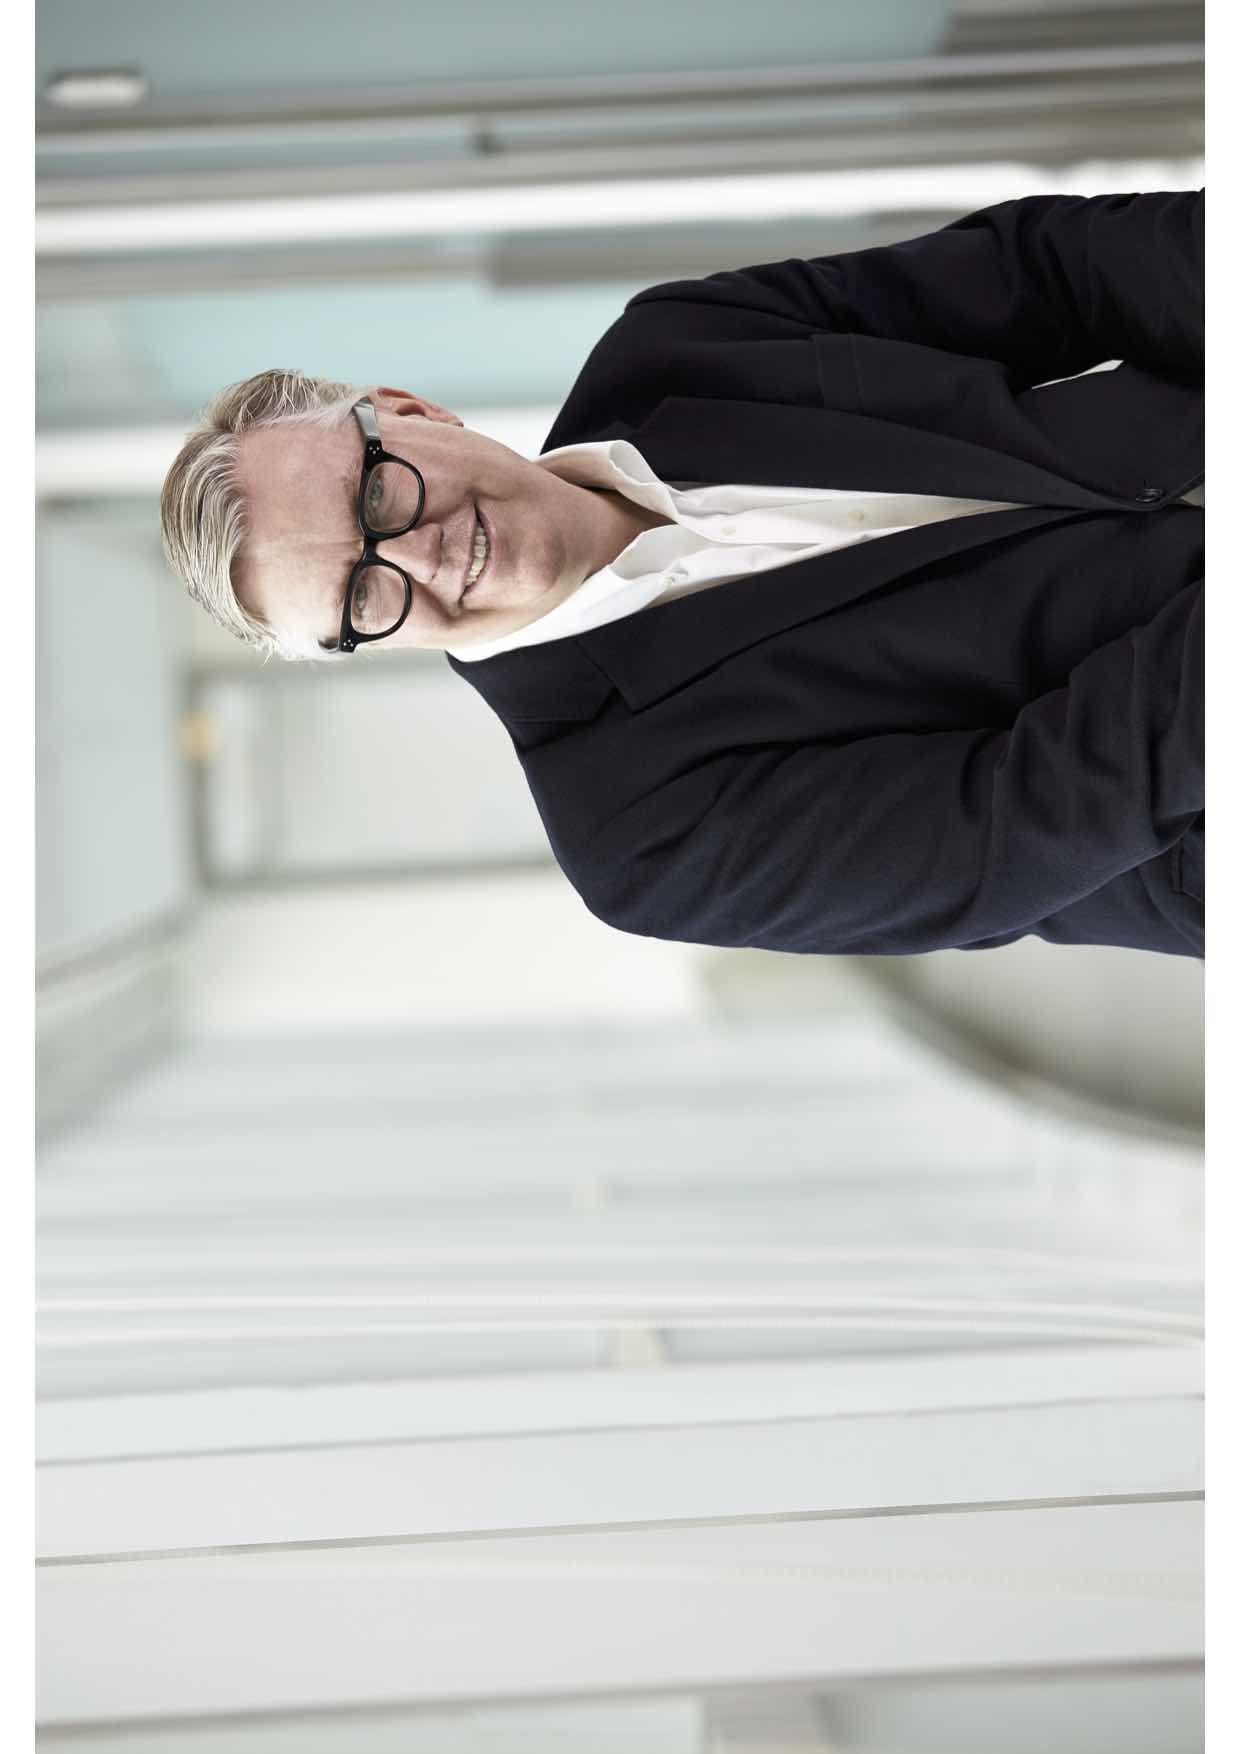 Lars Nittve